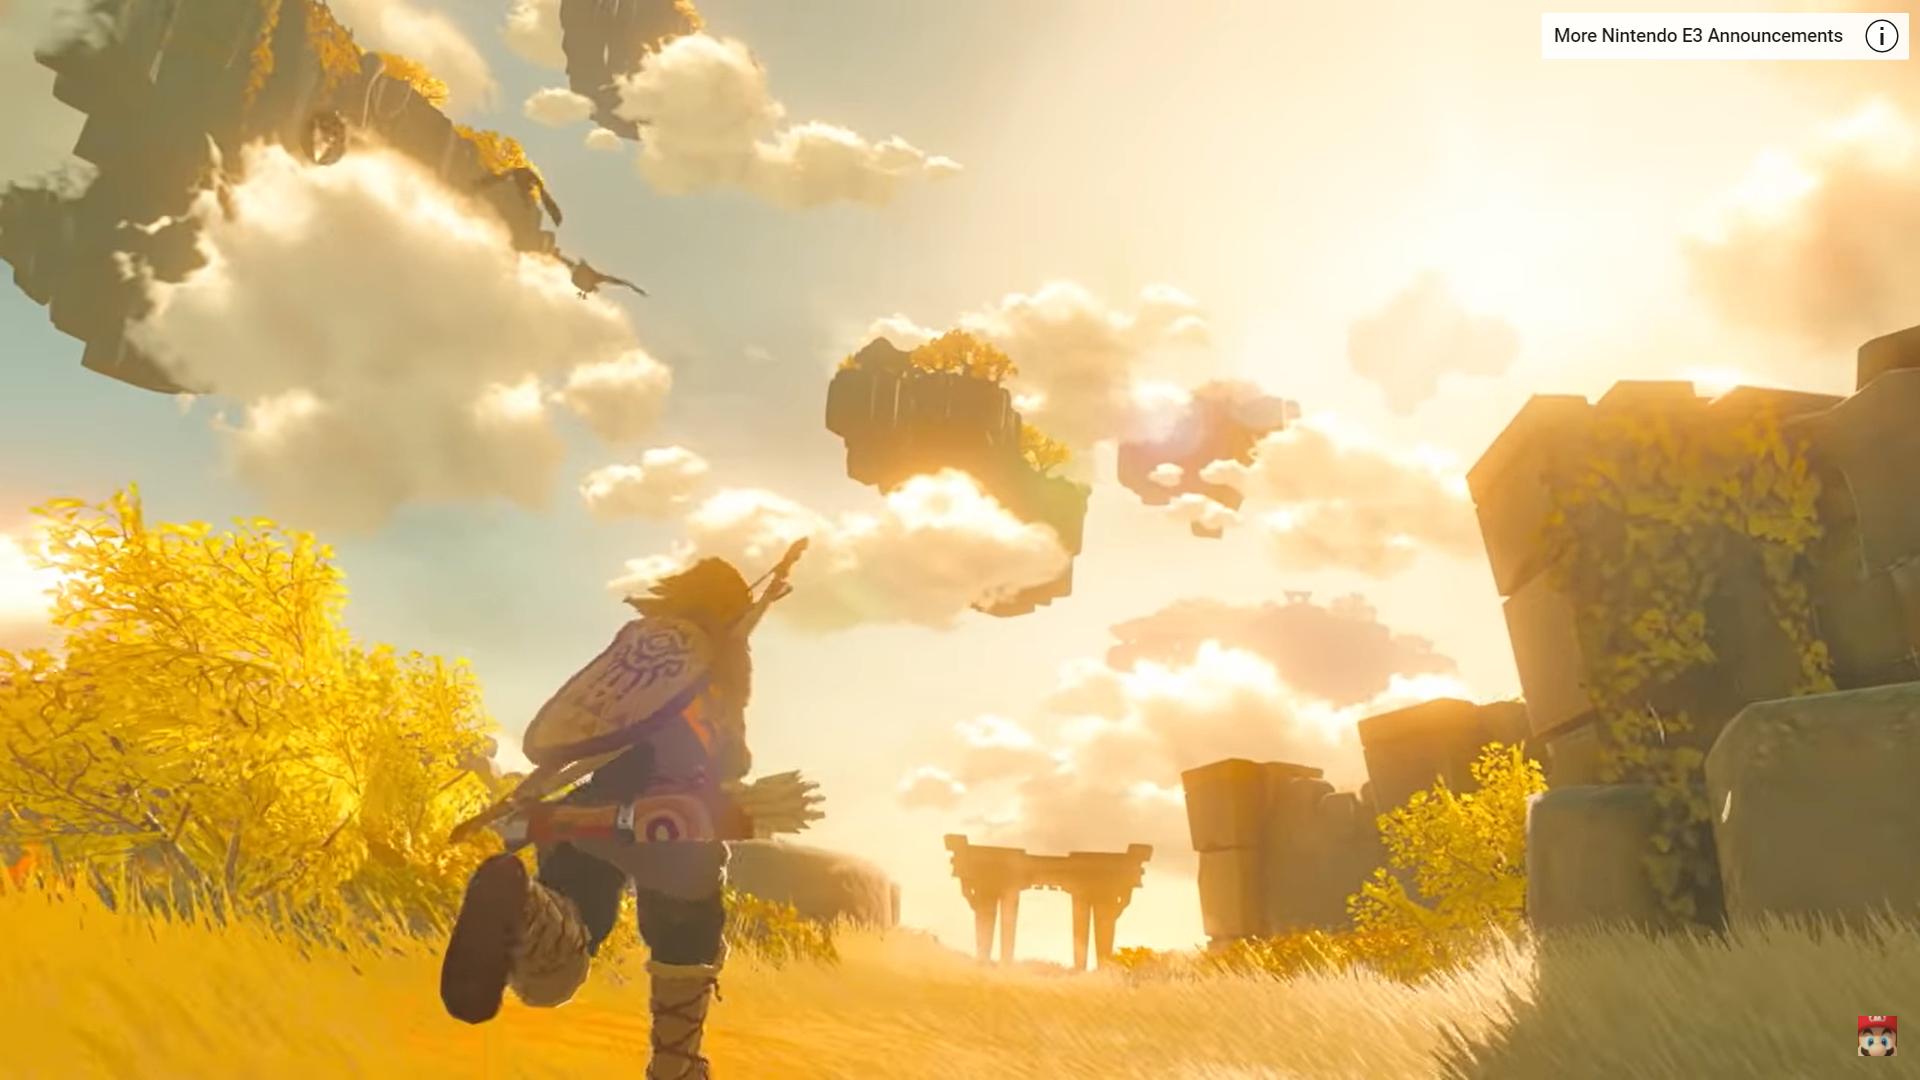 Breath of the Wild Sequel Screenshot